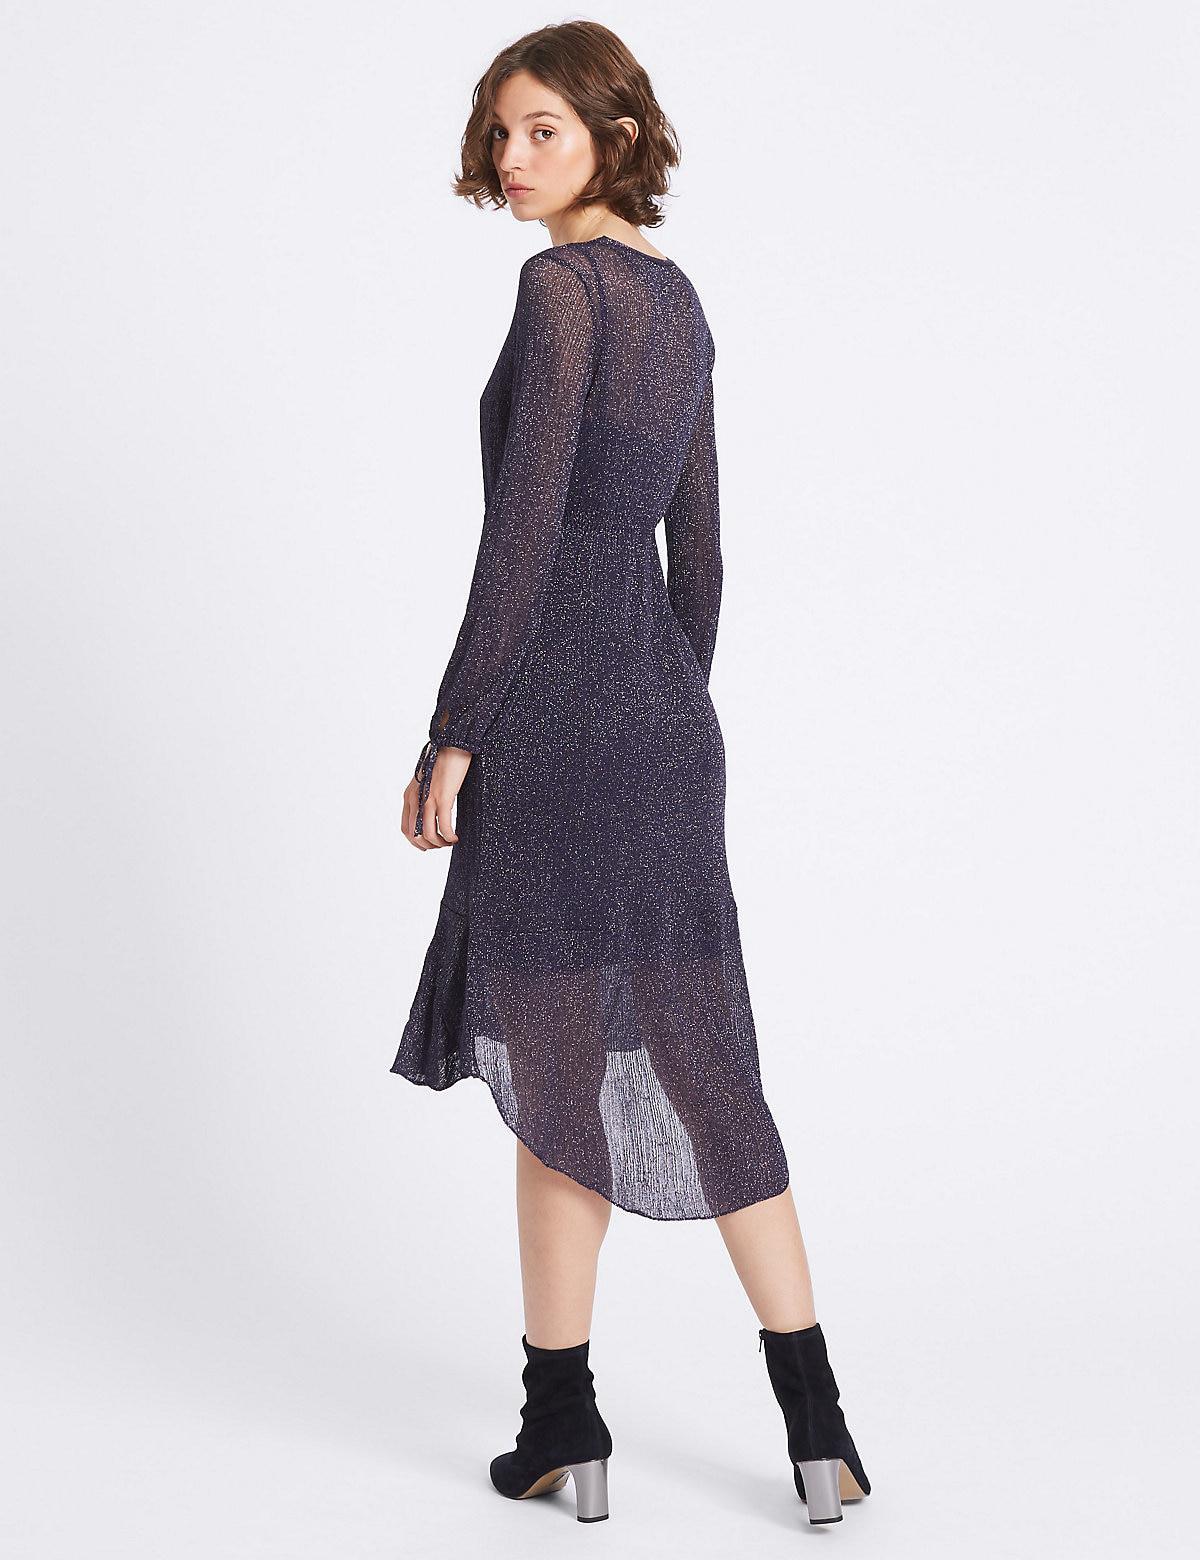 Excepcional Marks & Spencer Vestido De Dama Embellecimiento - Ideas ...